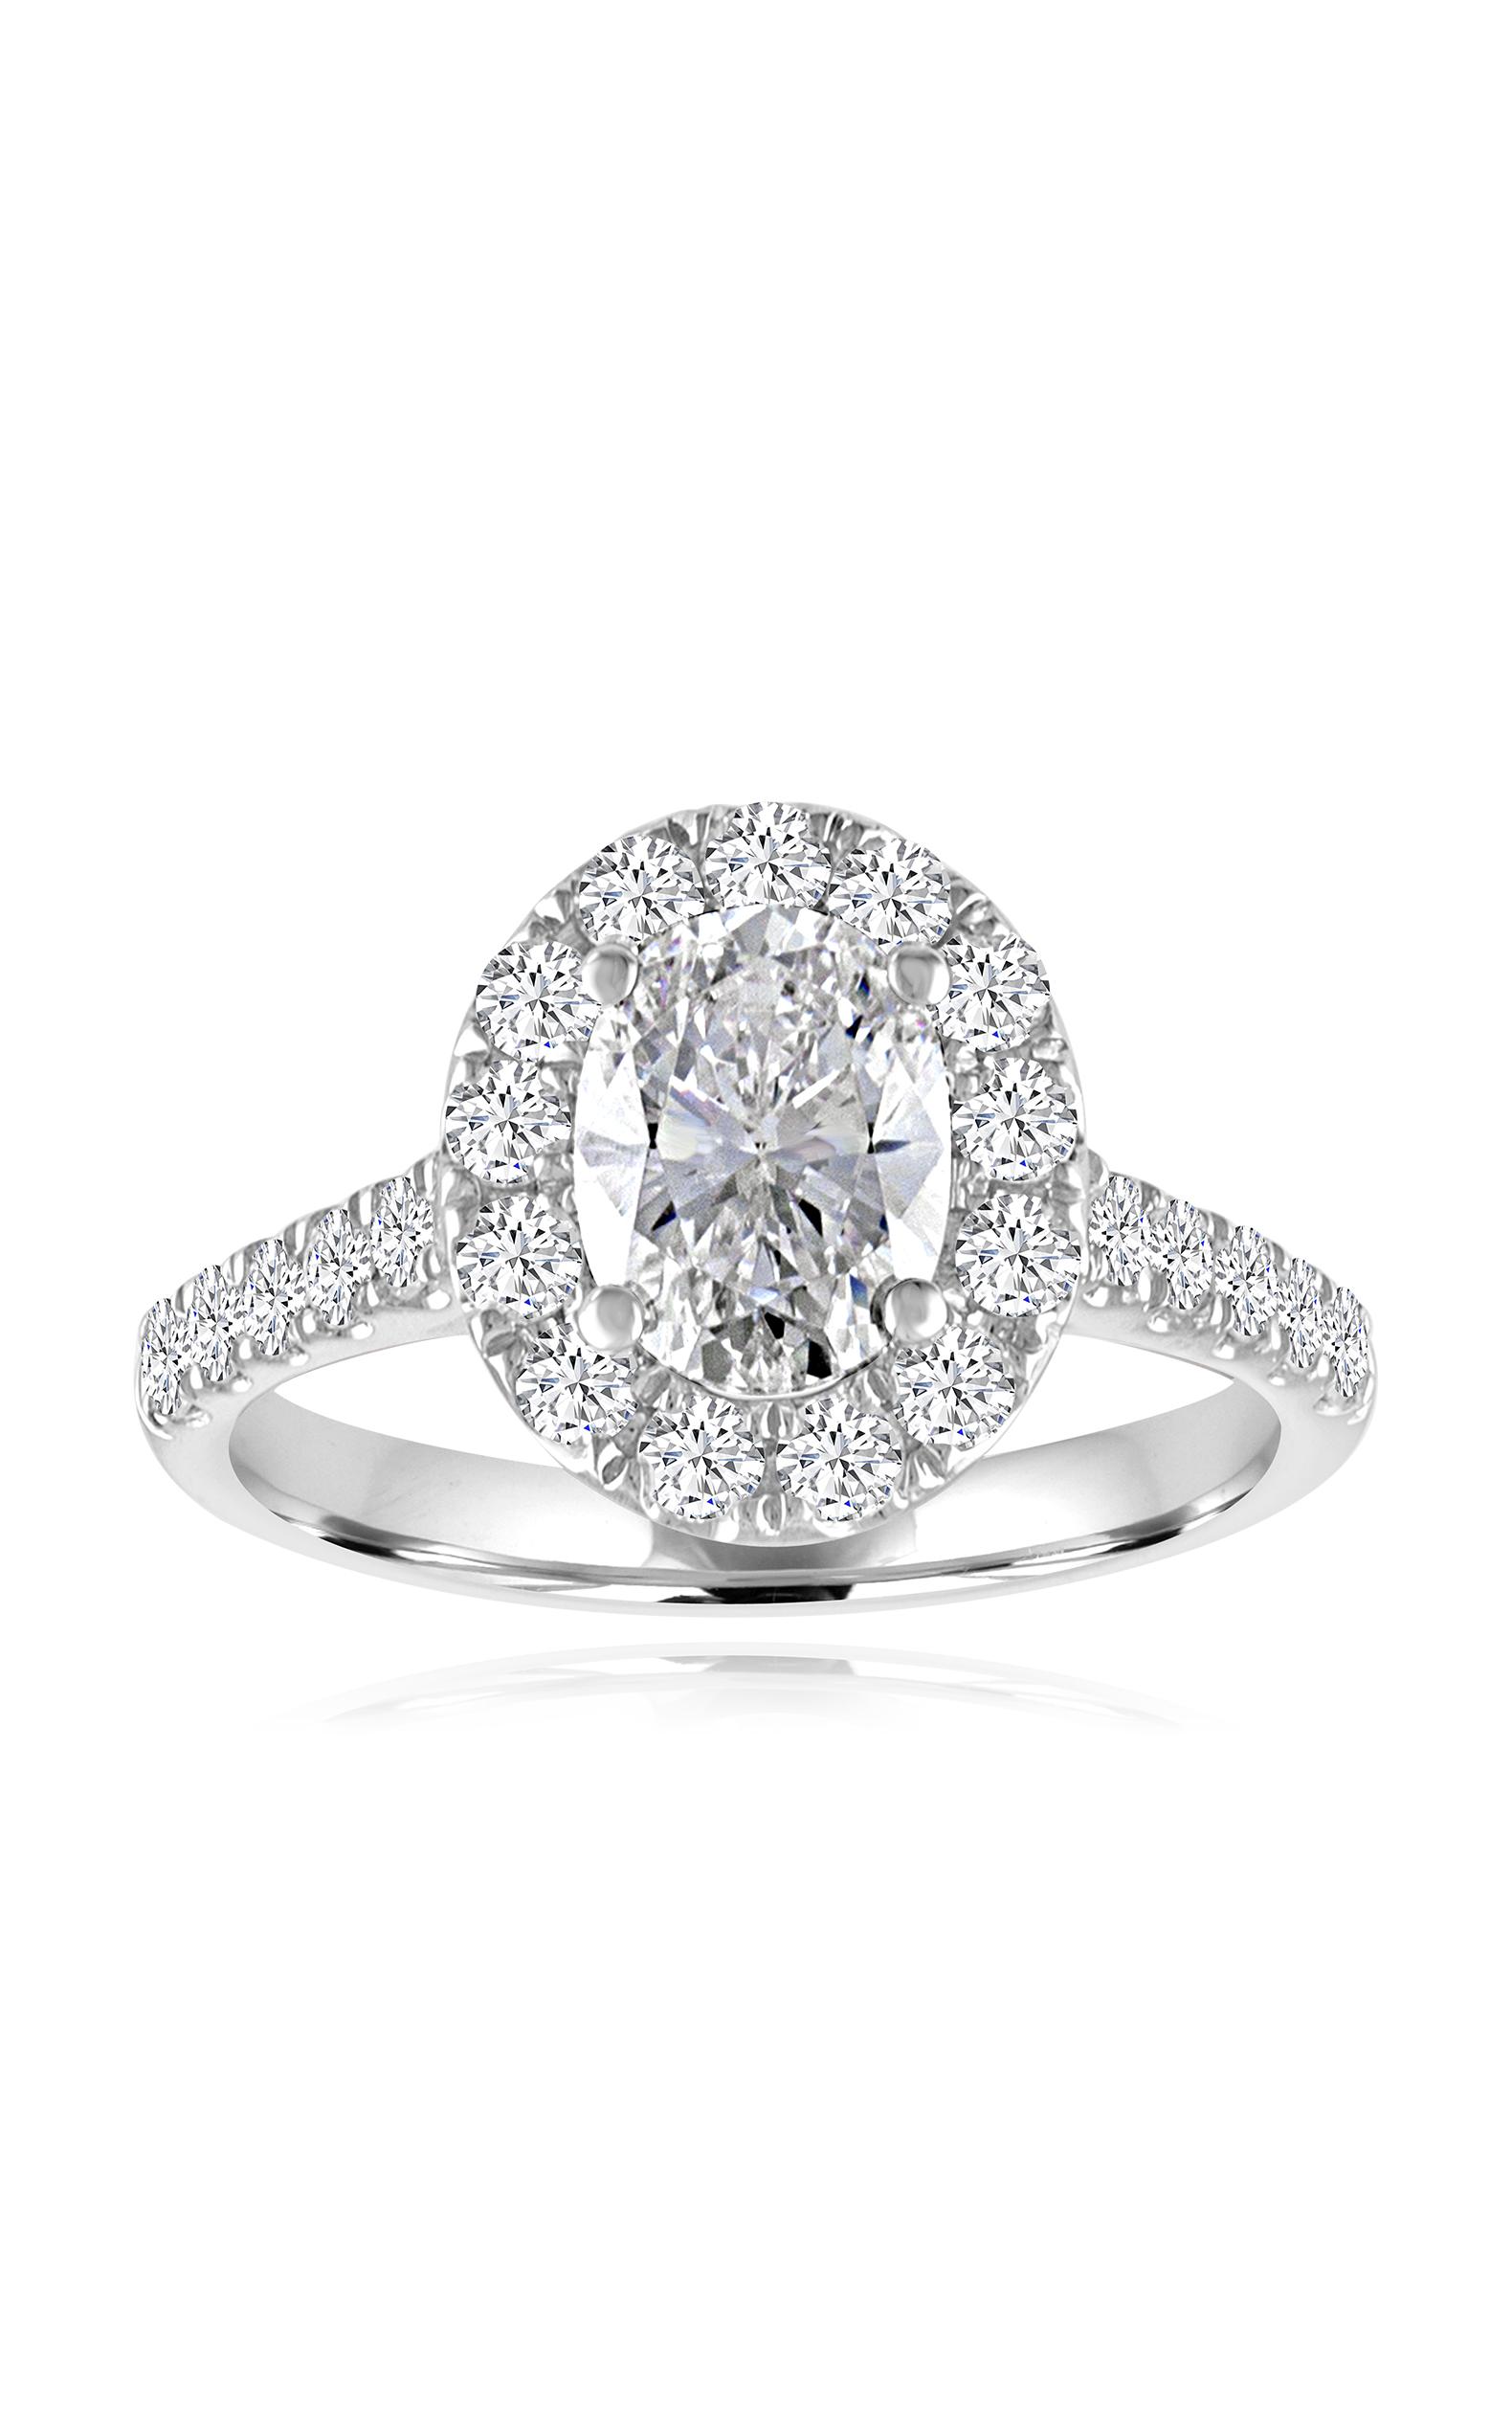 Imagine Bridal Engagement Rings 63256D-3 4 product image